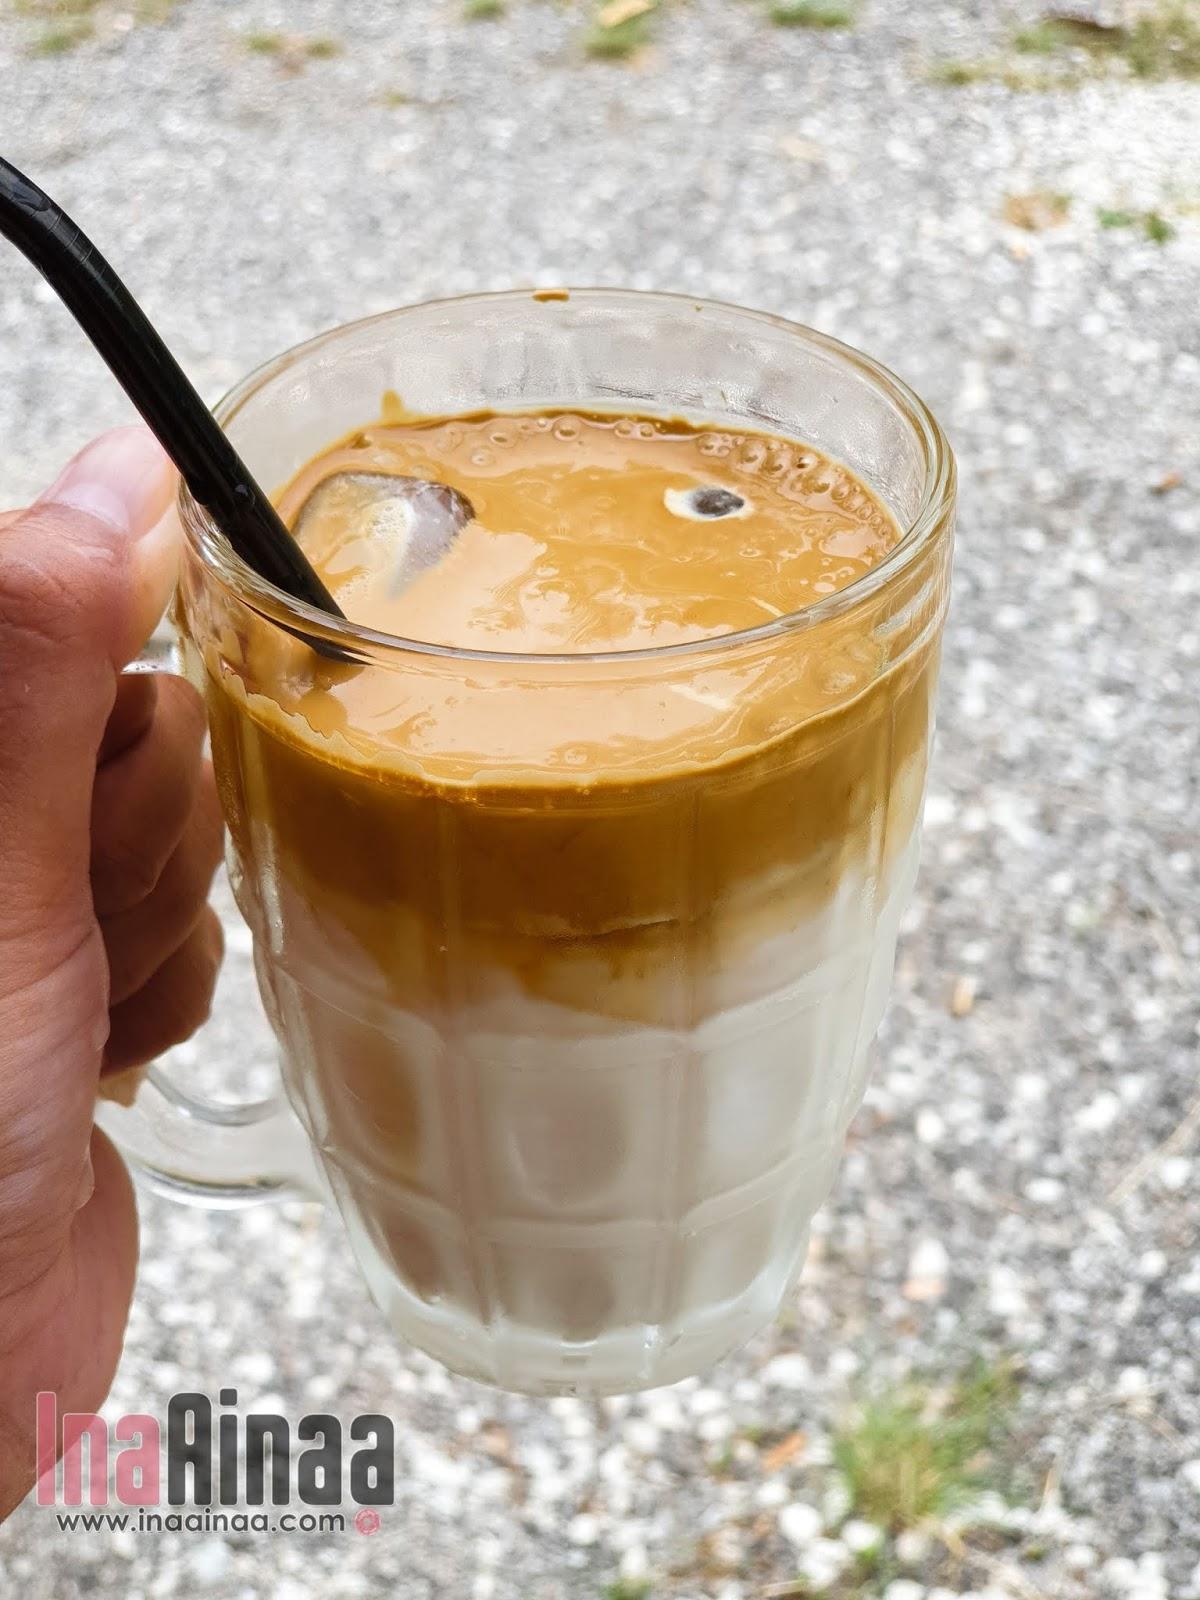 RESEPI DALGONA COFFEE - Hak Milik Ina Ainaa